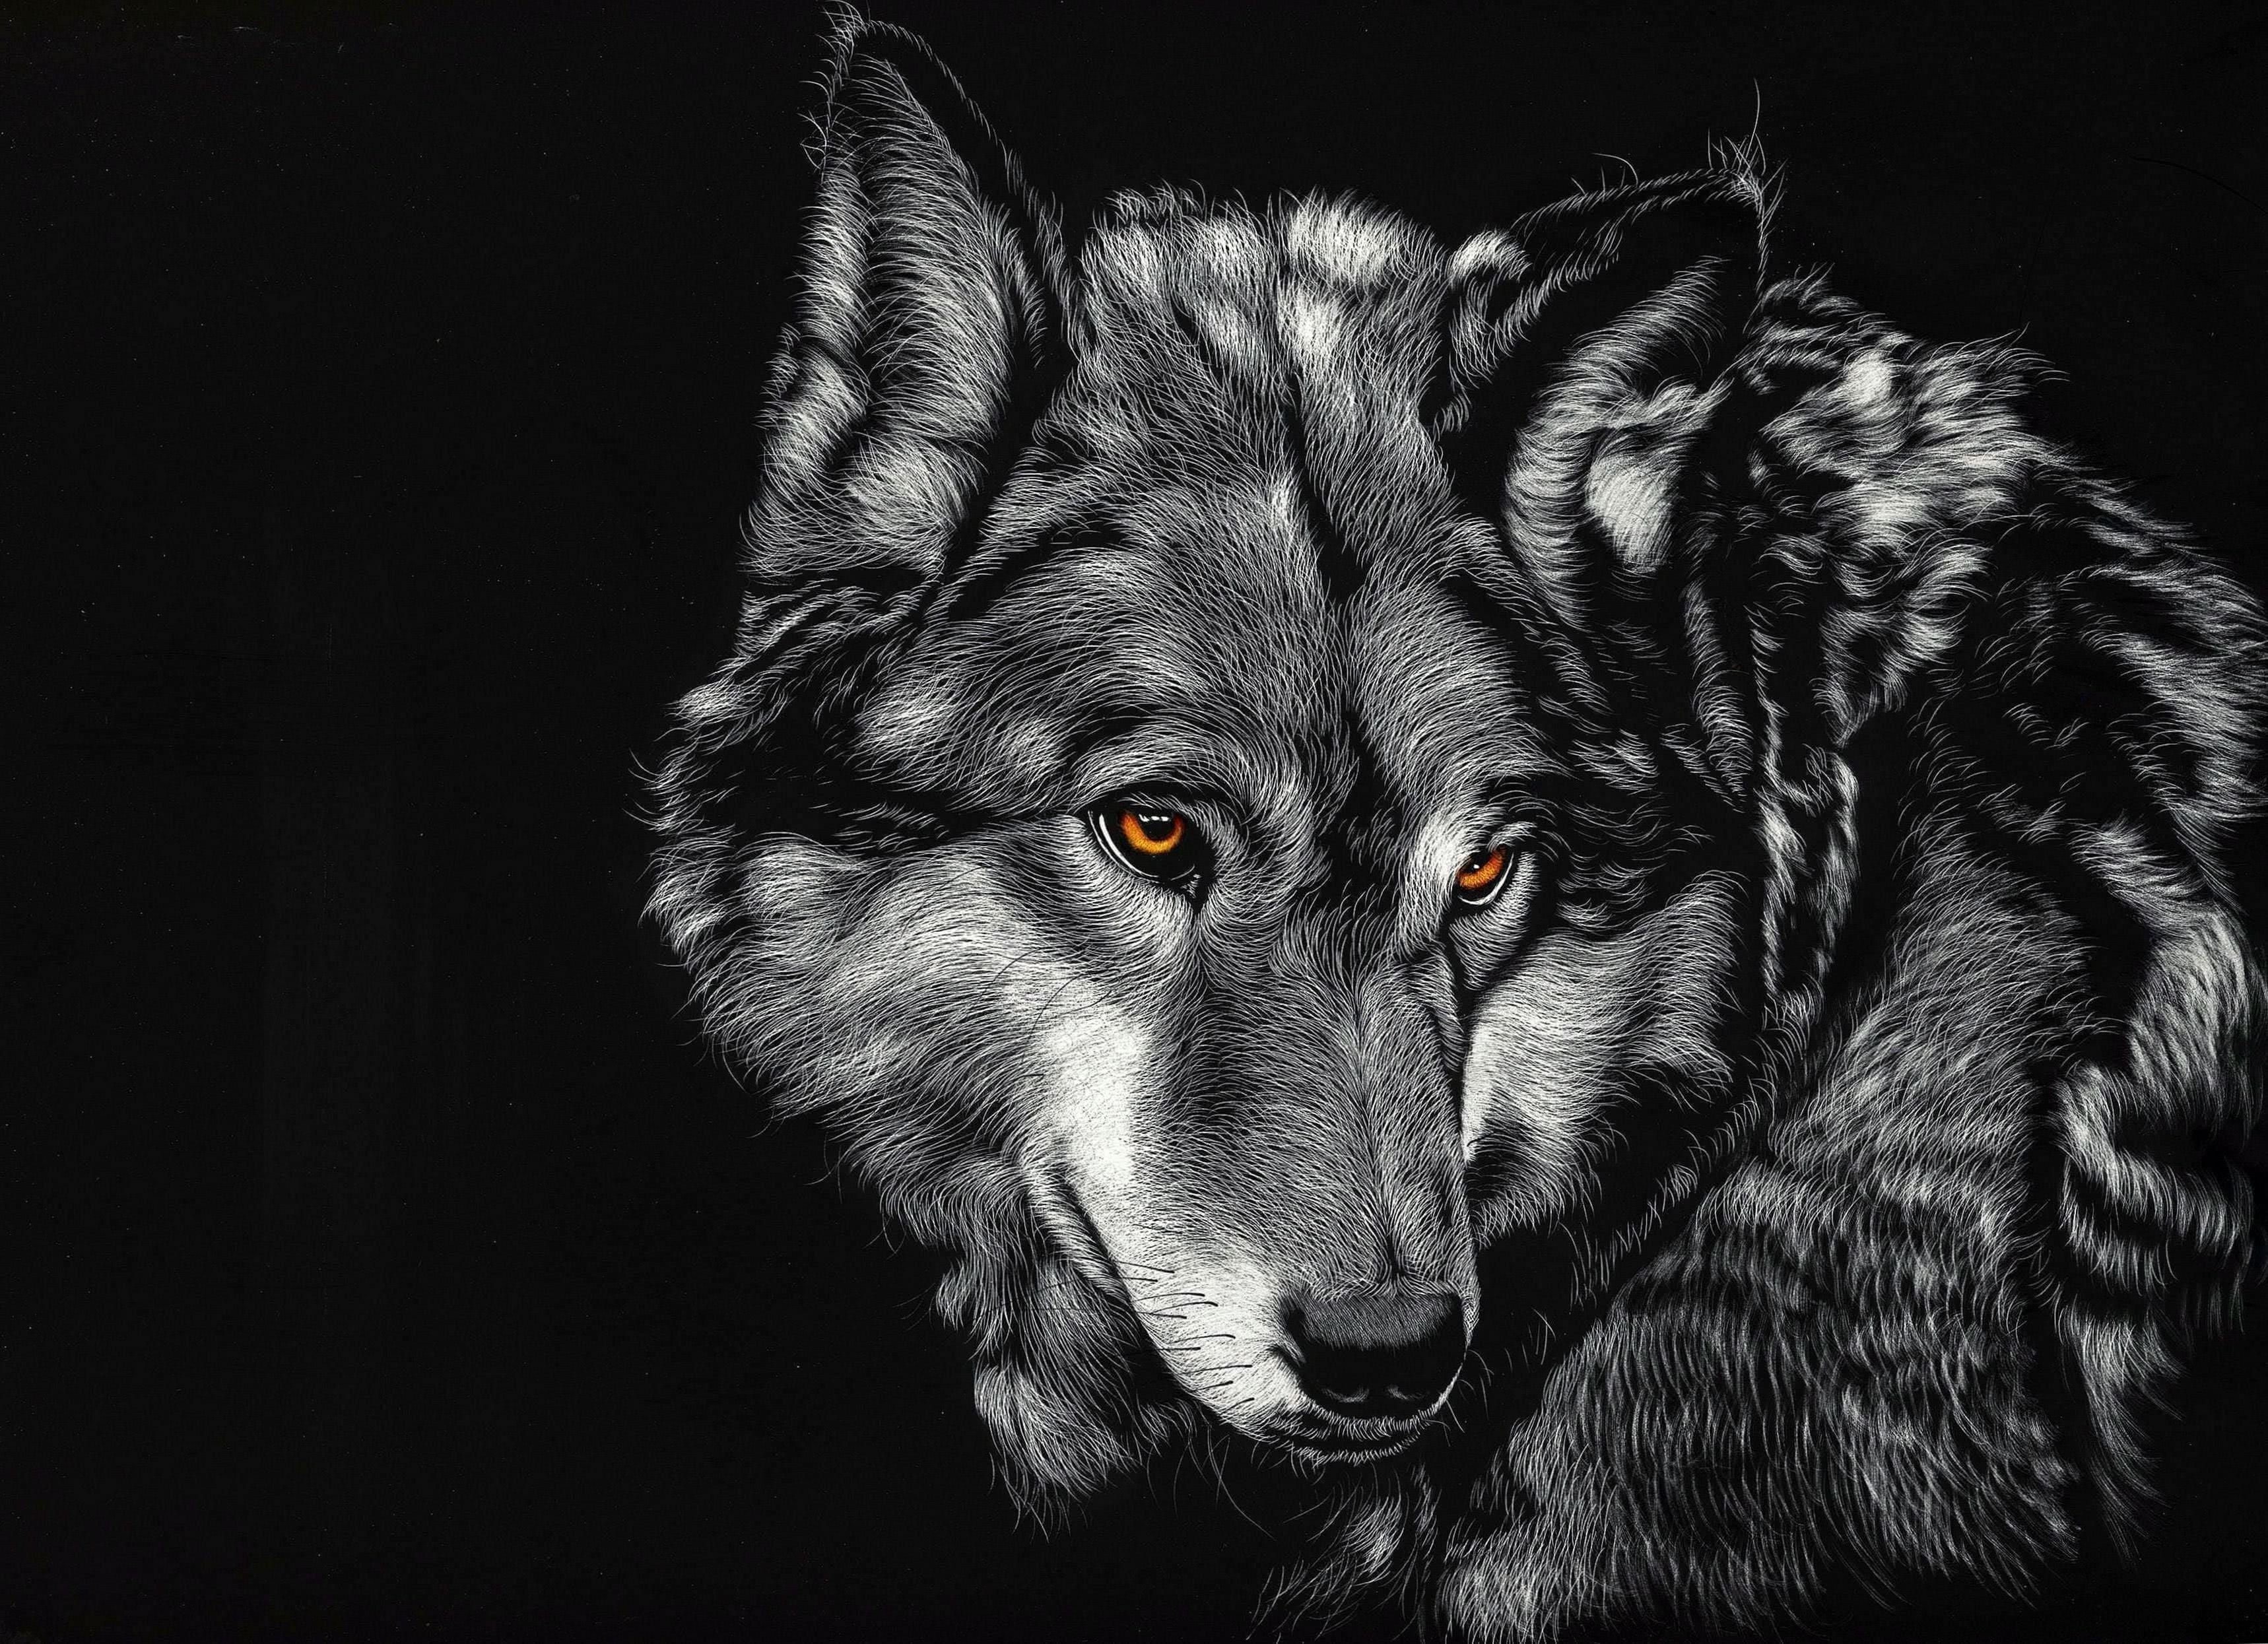 Wallpaper 4K Wolf